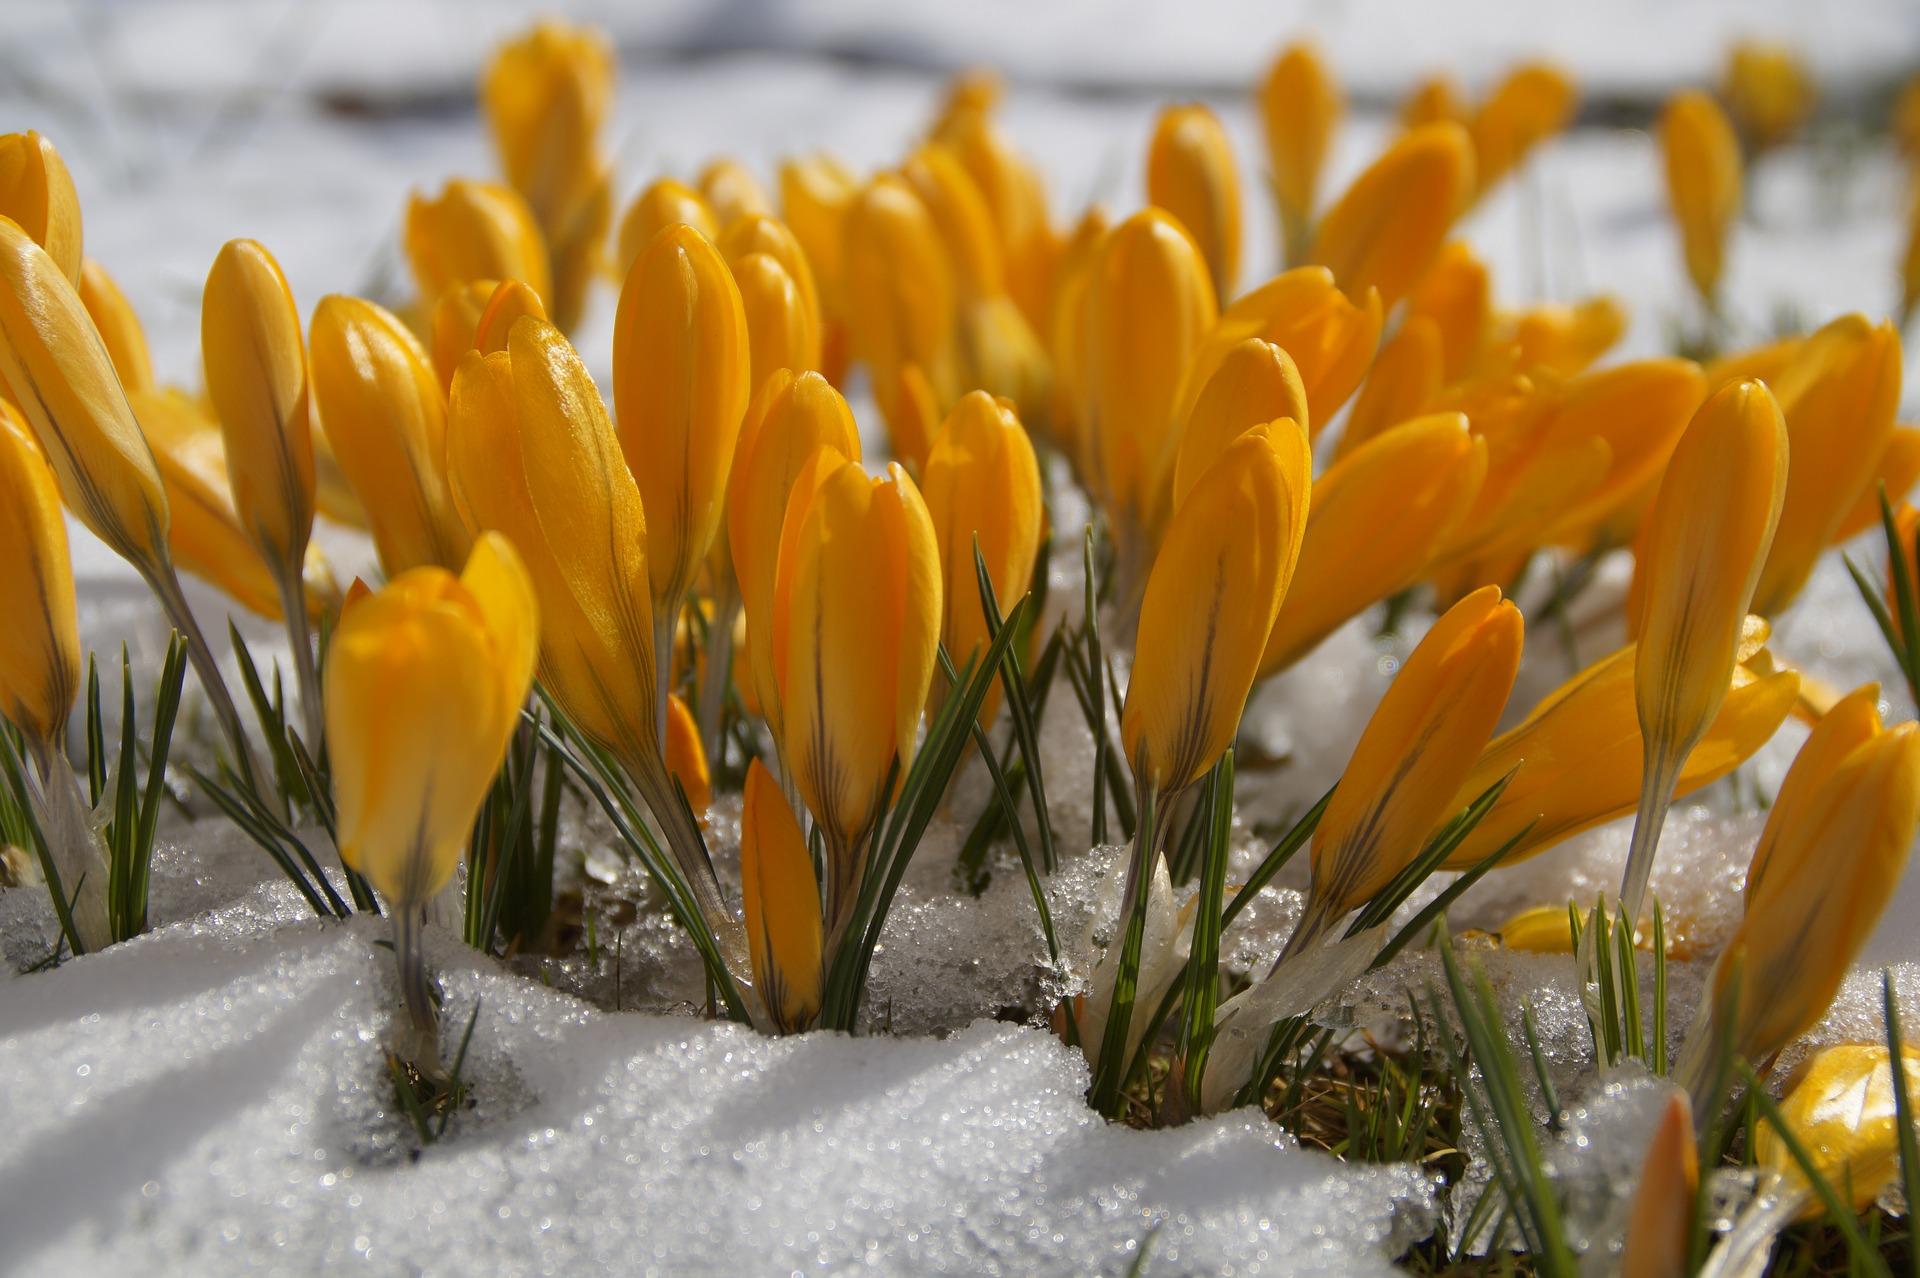 Plants Outdoors in Winter